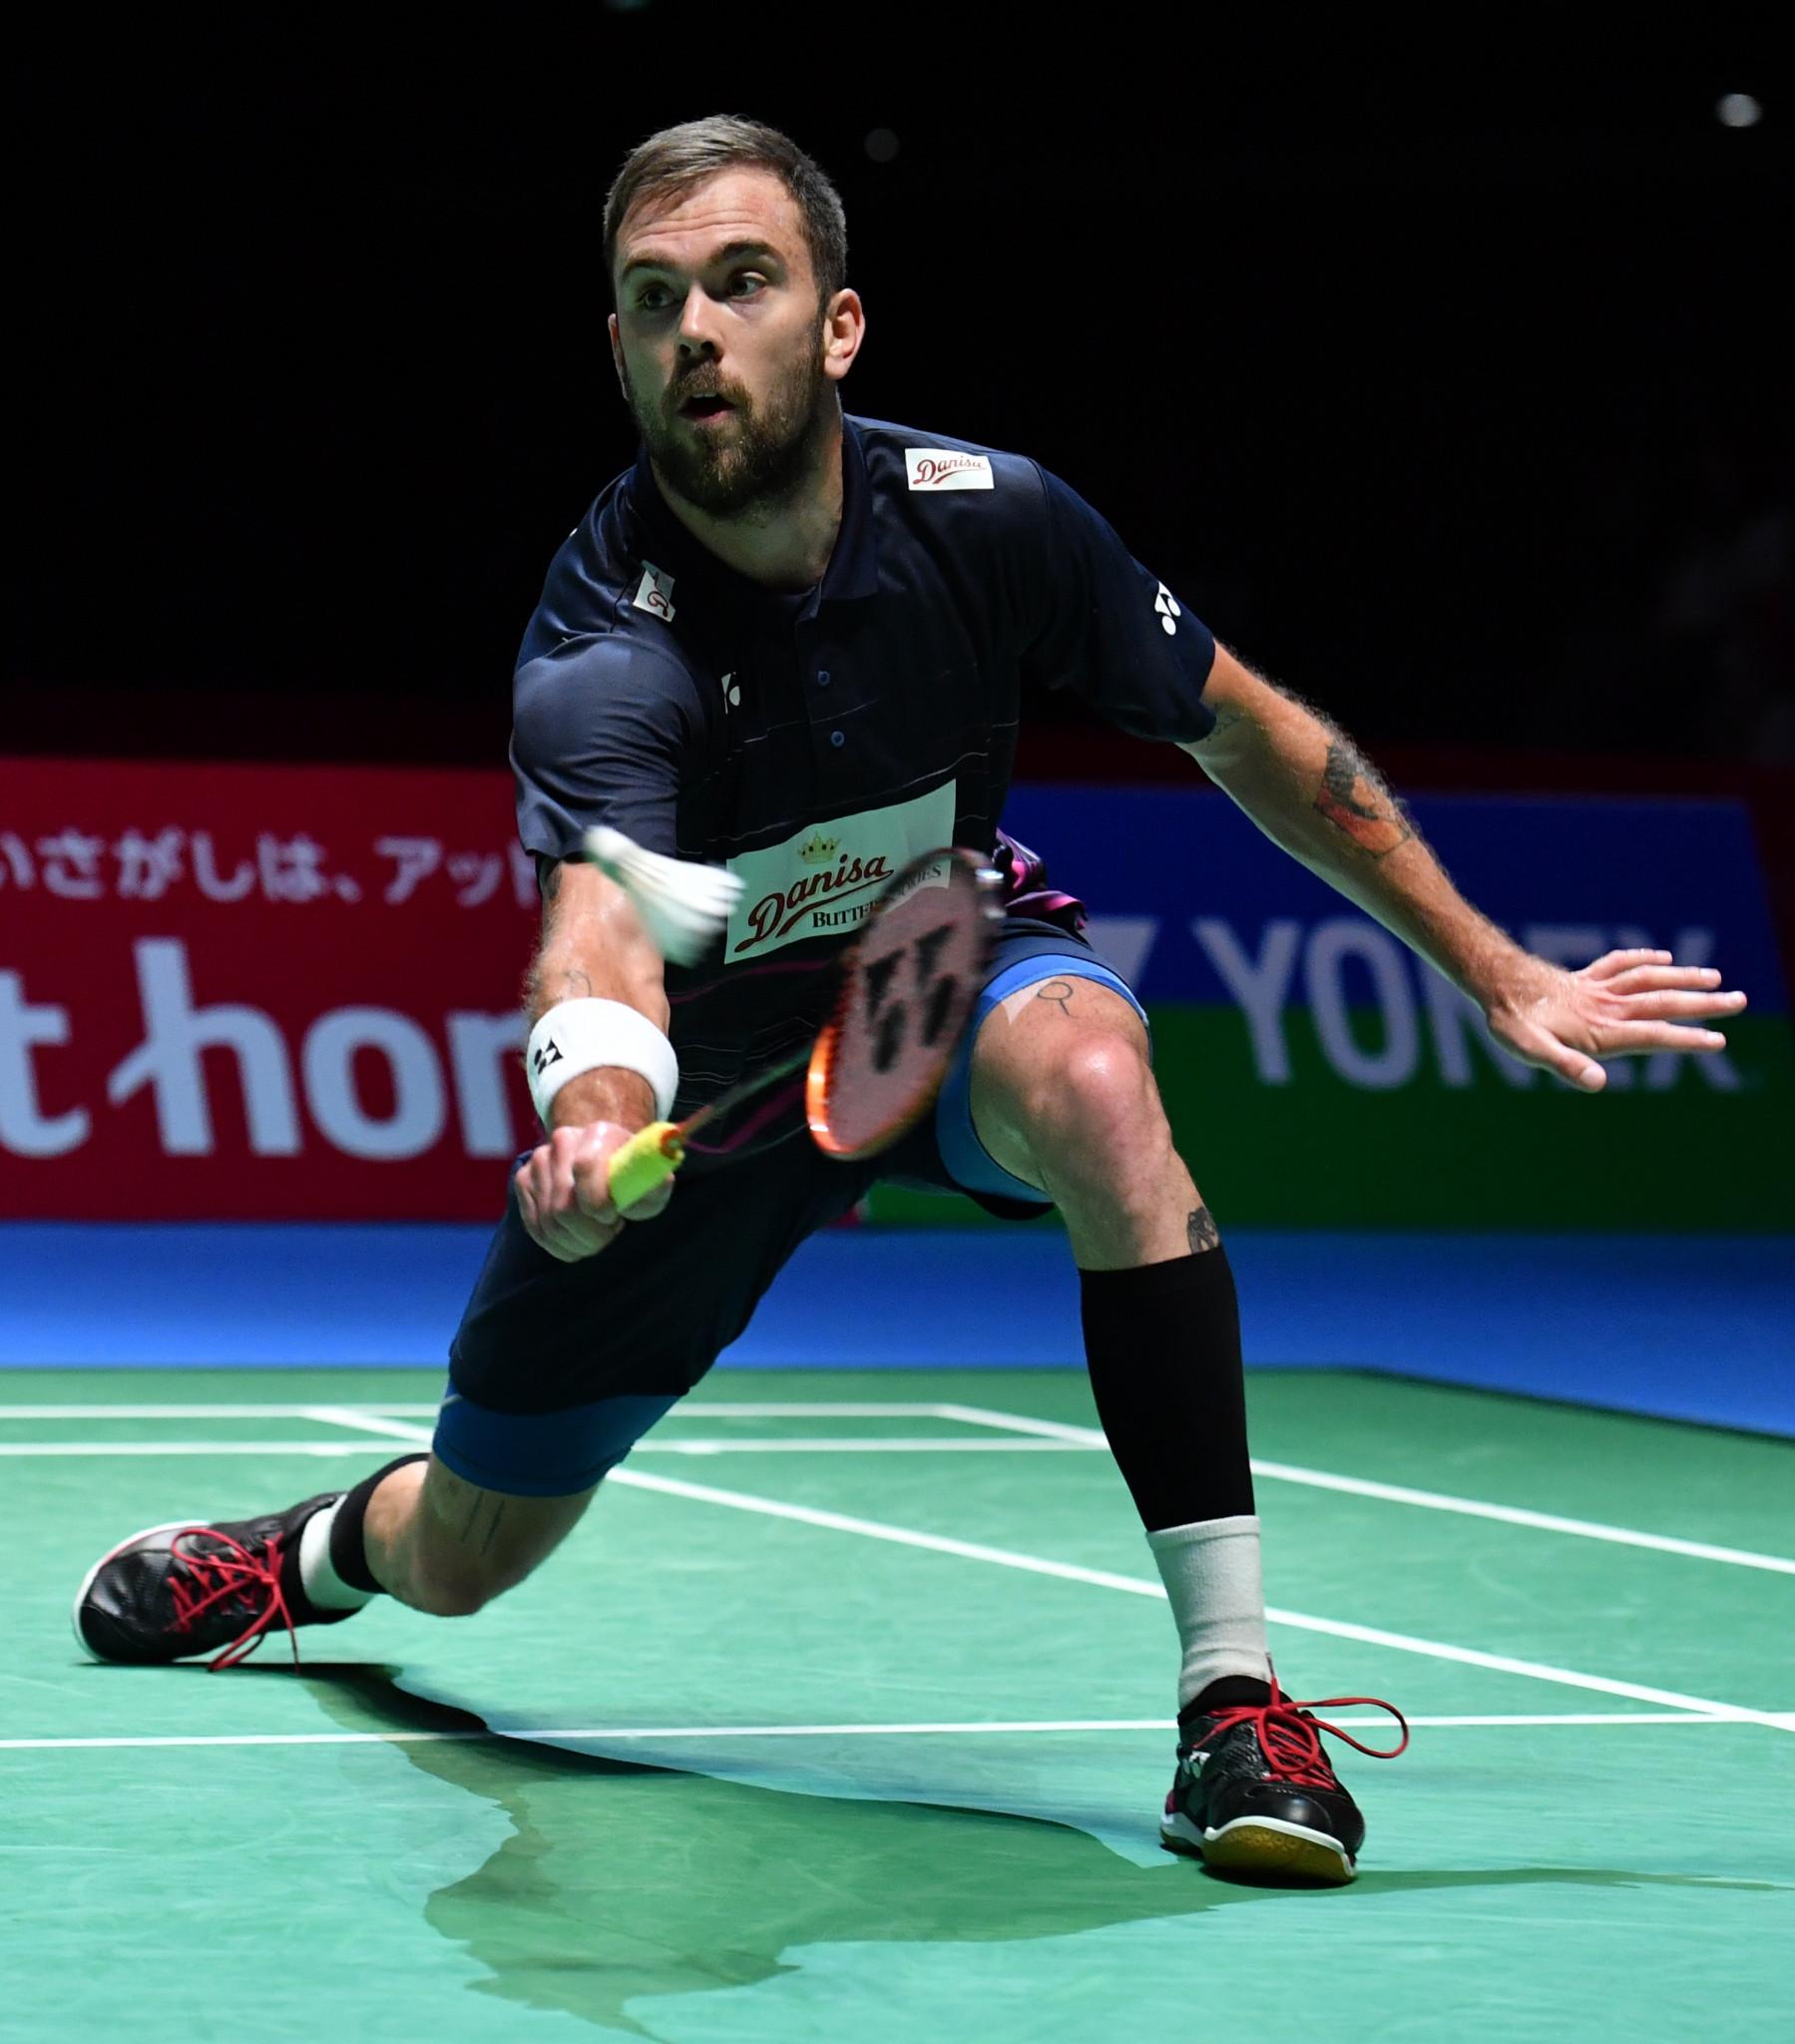 Top seeds Denmark reach men's and women's finals at European Team Badminton Championships